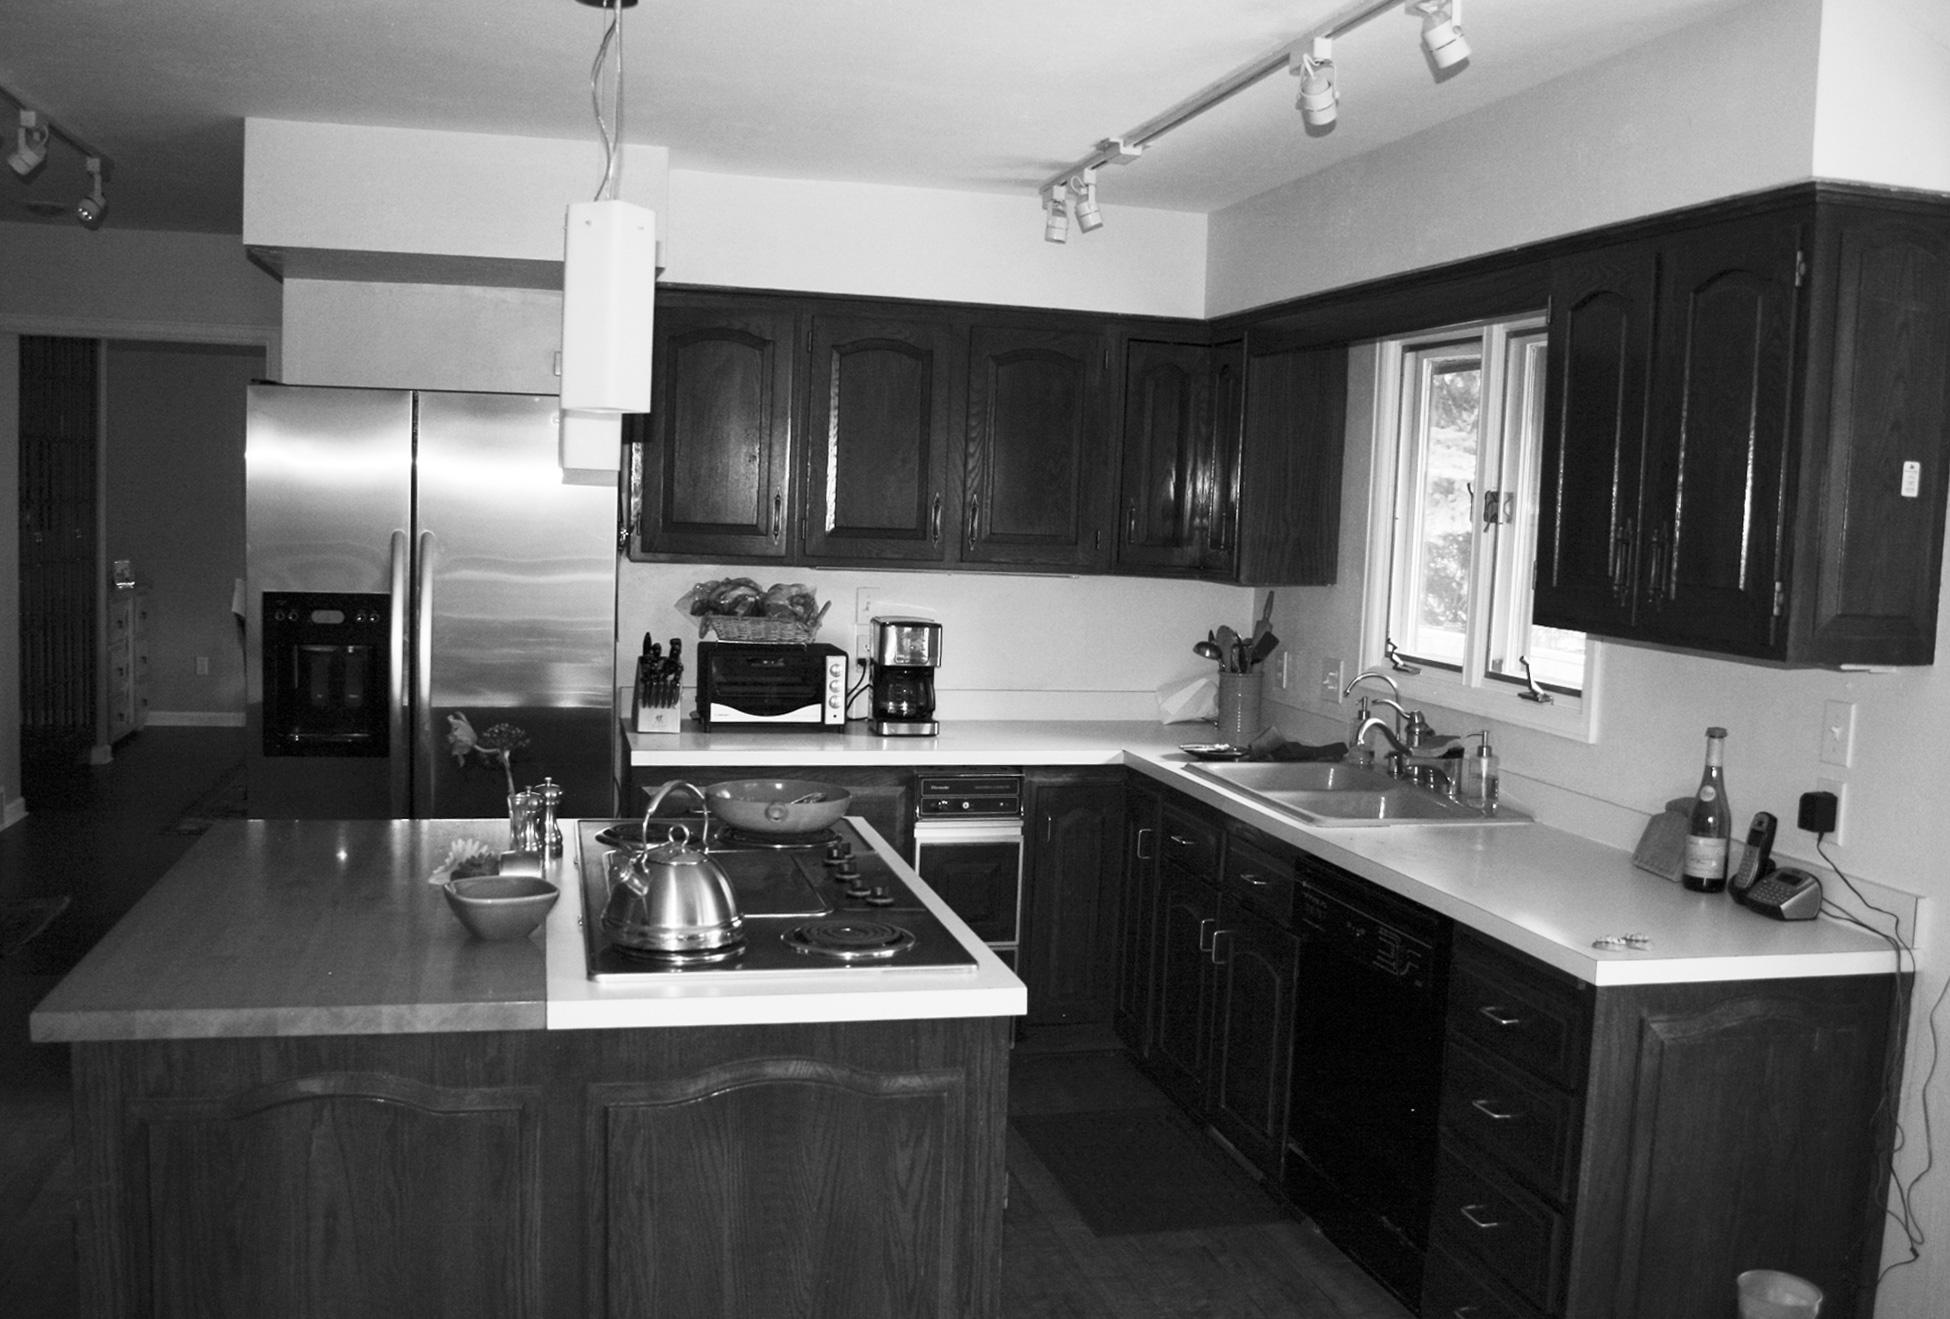 Boulder Modern Home Remodel - HMH Architecture + Interiors - Boulder